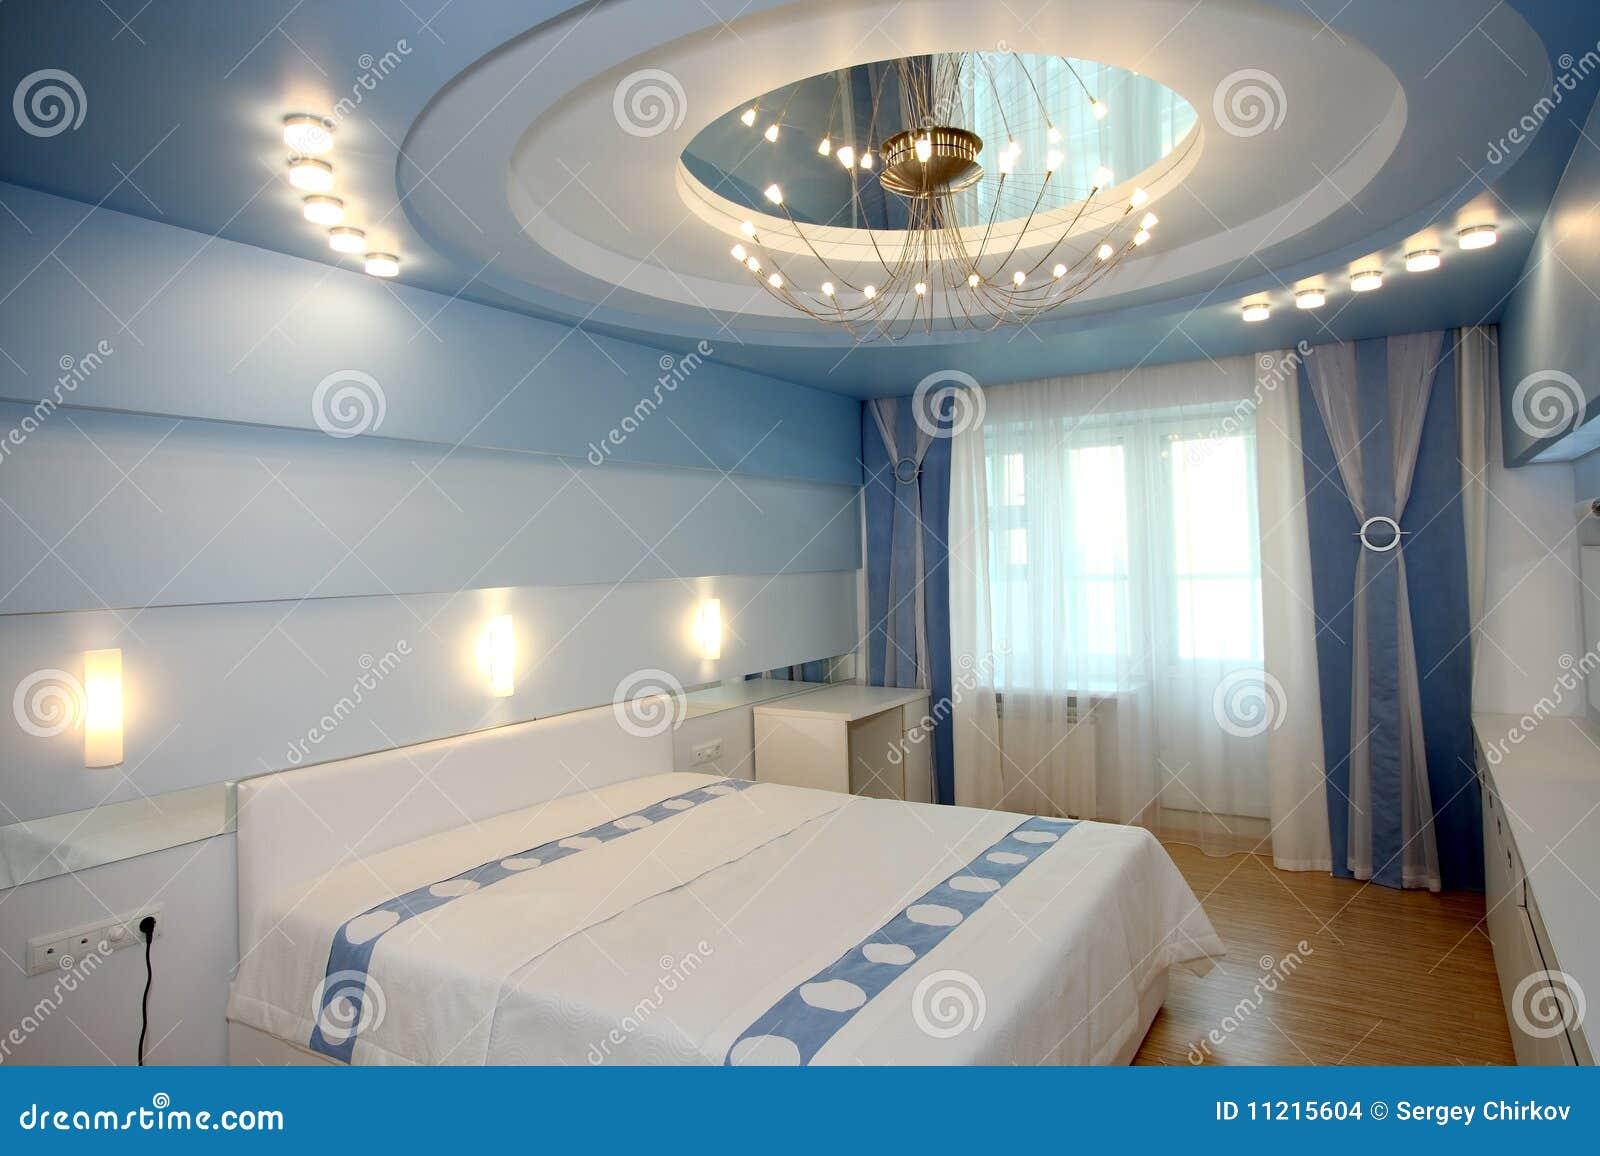 Spiegel Fur Schlafzimmer Decke – eyesopen.co